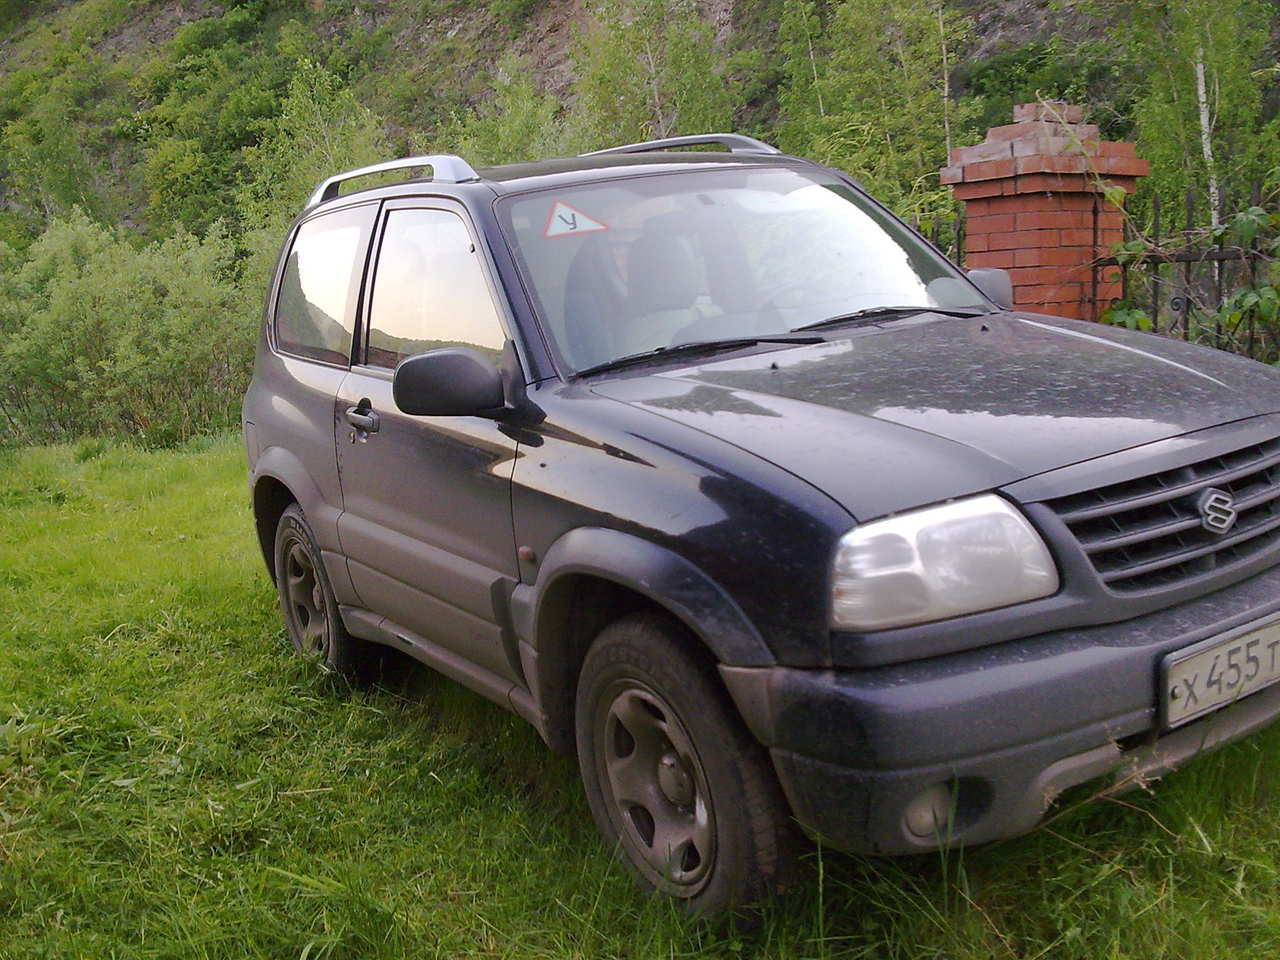 [2003 Suzuki Grand Vitara Chassis Manual] - 2003 Suzuki ...